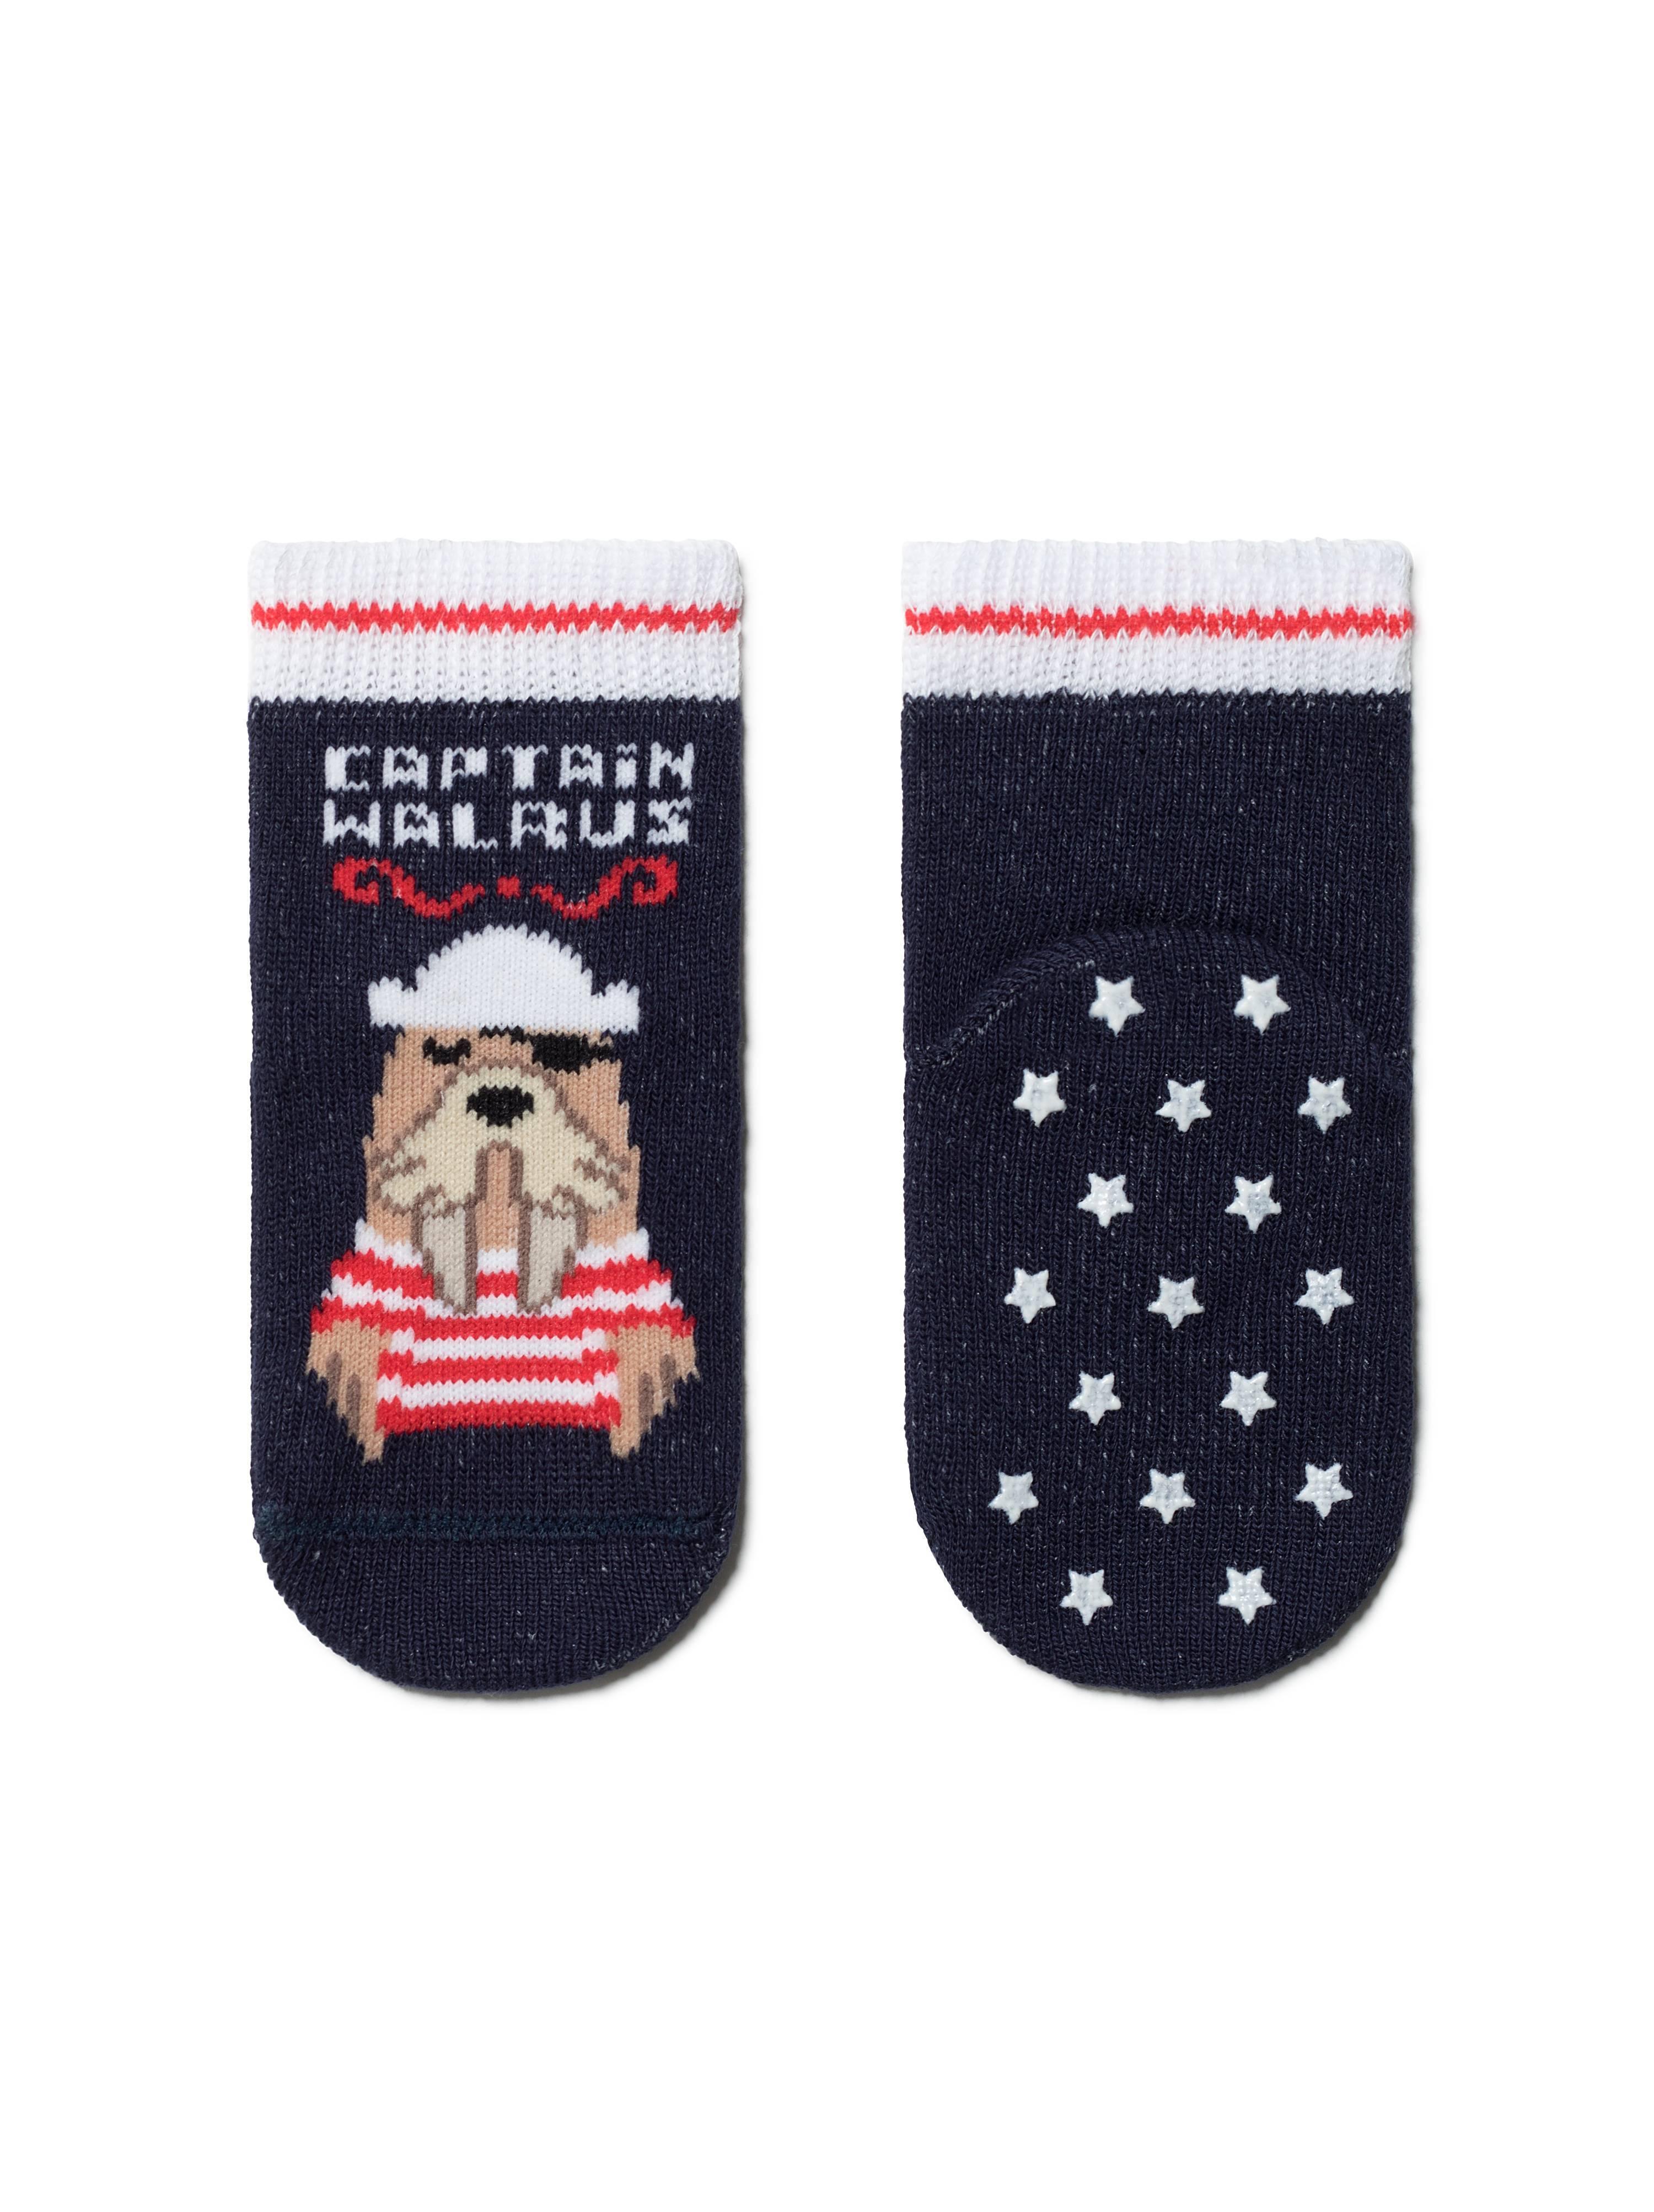 Носки детские ⭐️ Антискользящие носки TIP-TOP с рисунком «Морж» ⭐️